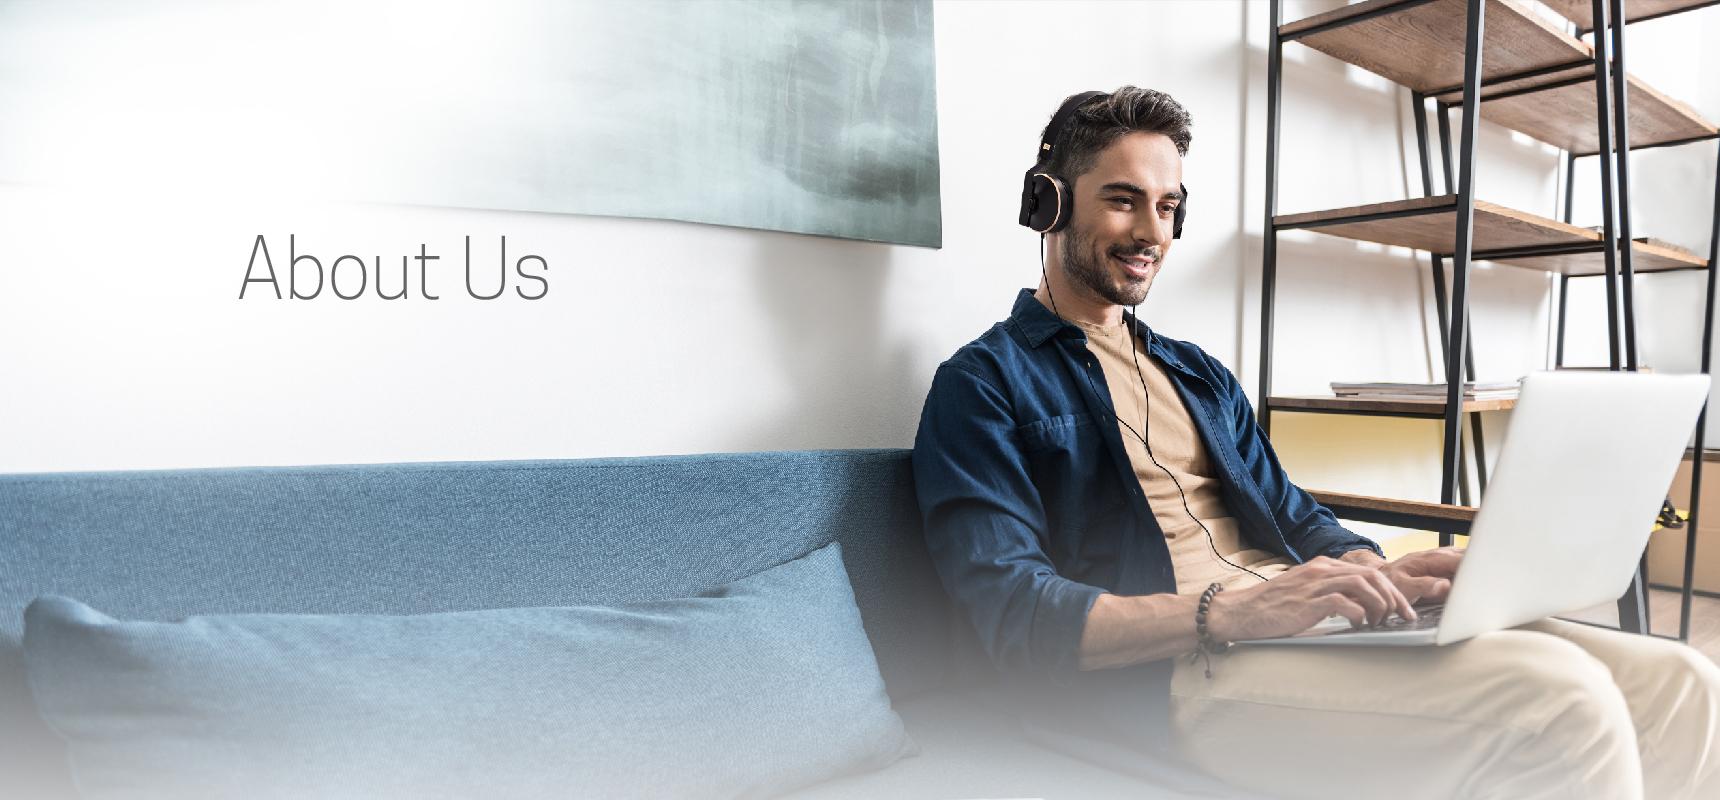 MAS AUDIO SCIENCE,MAS headphones, about MAS